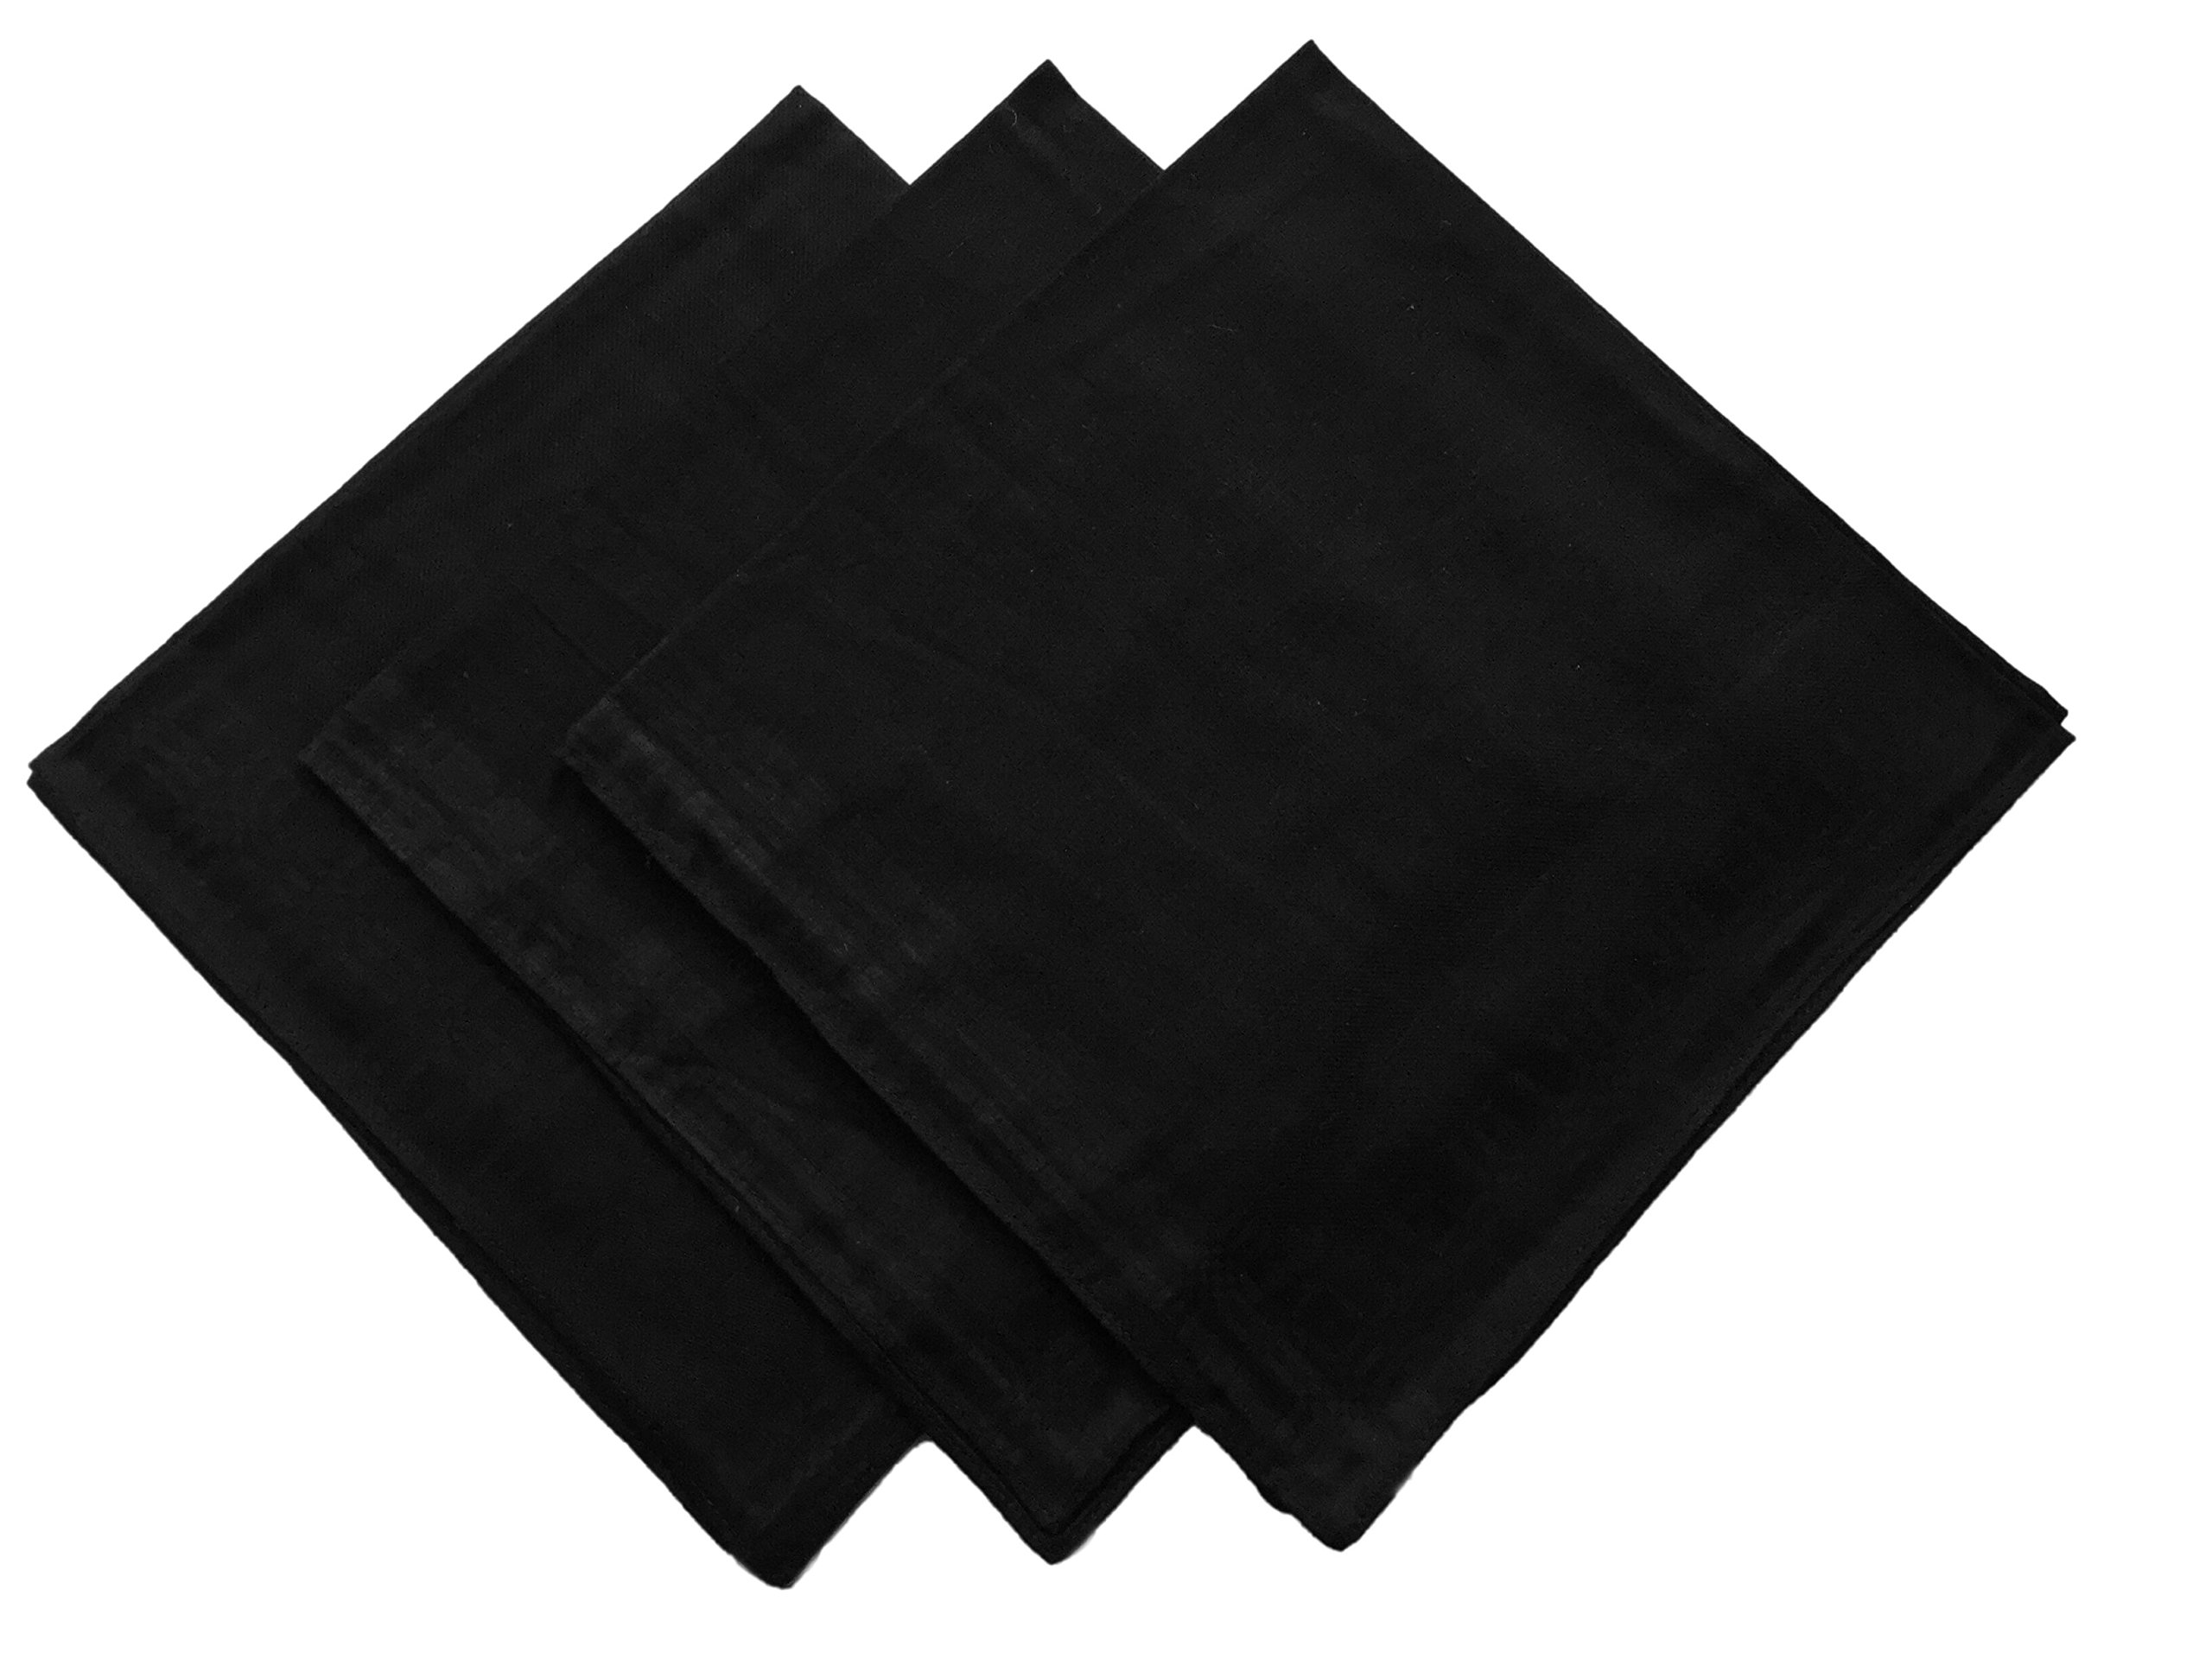 KINGDESON Men's Elegent Checkered Cotton Hankie Hankerchiefs gift set ((B)19.99(6PCS))